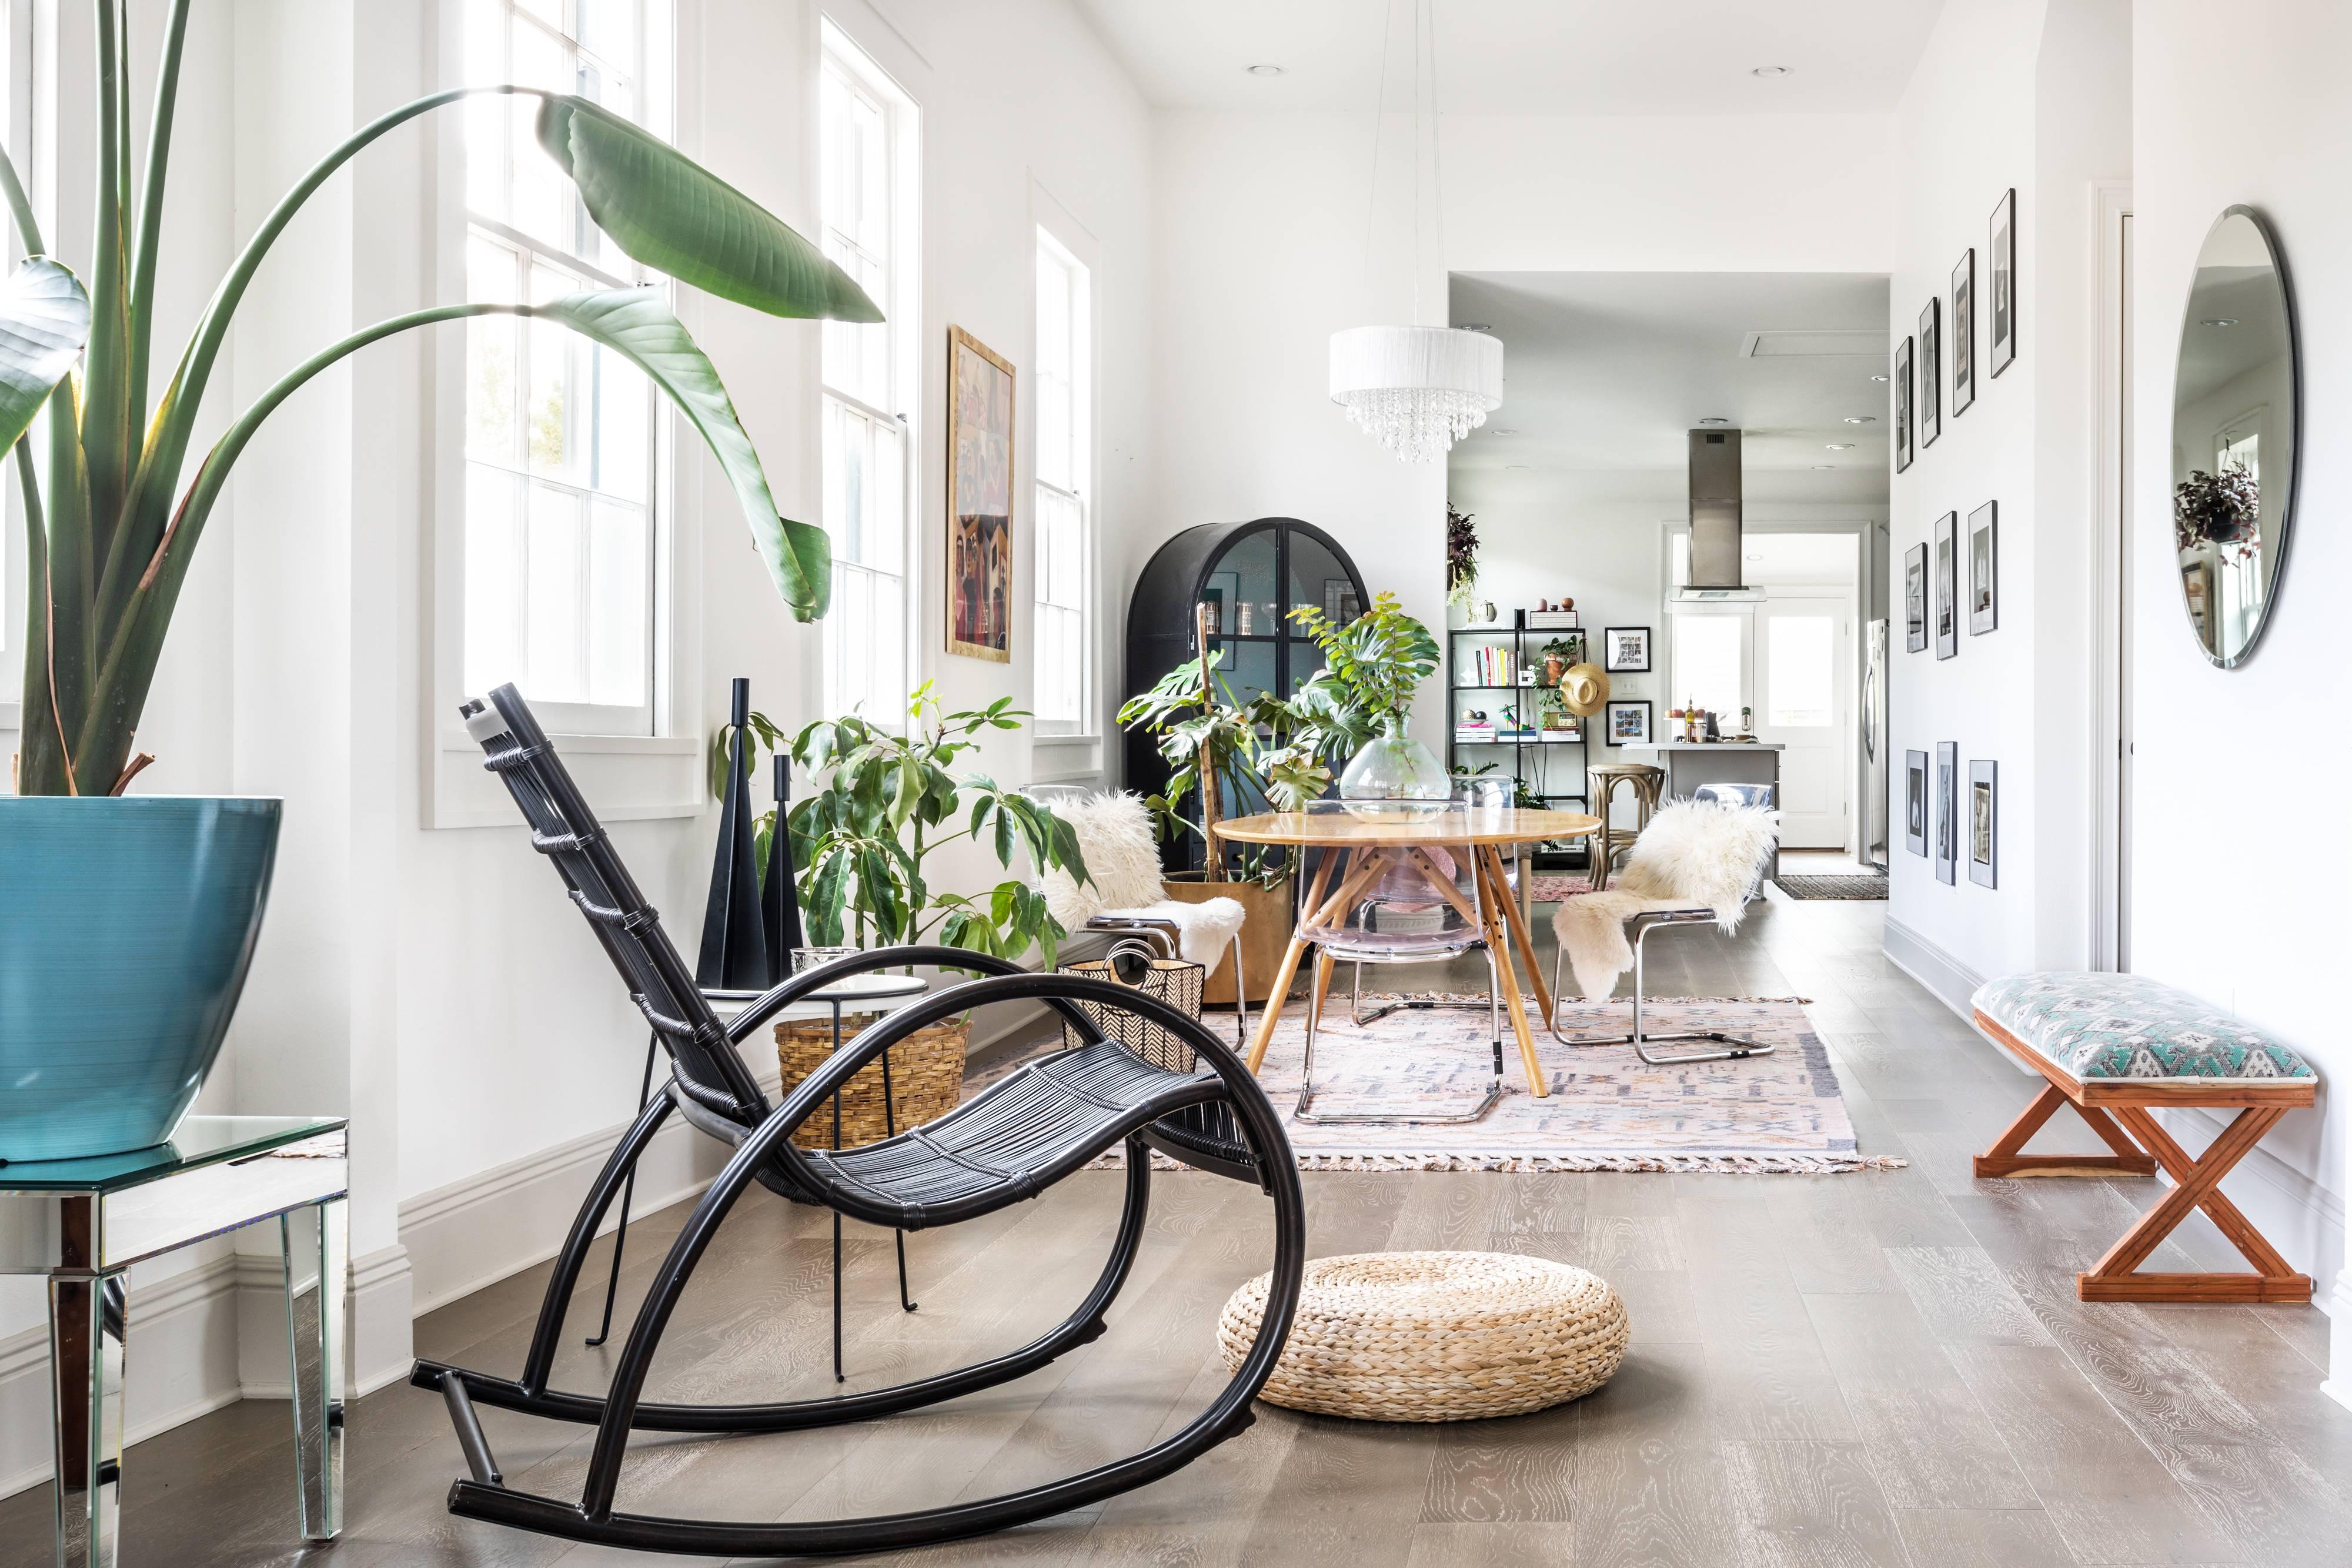 New Interior Decoration Trends for 2021 | Home Design